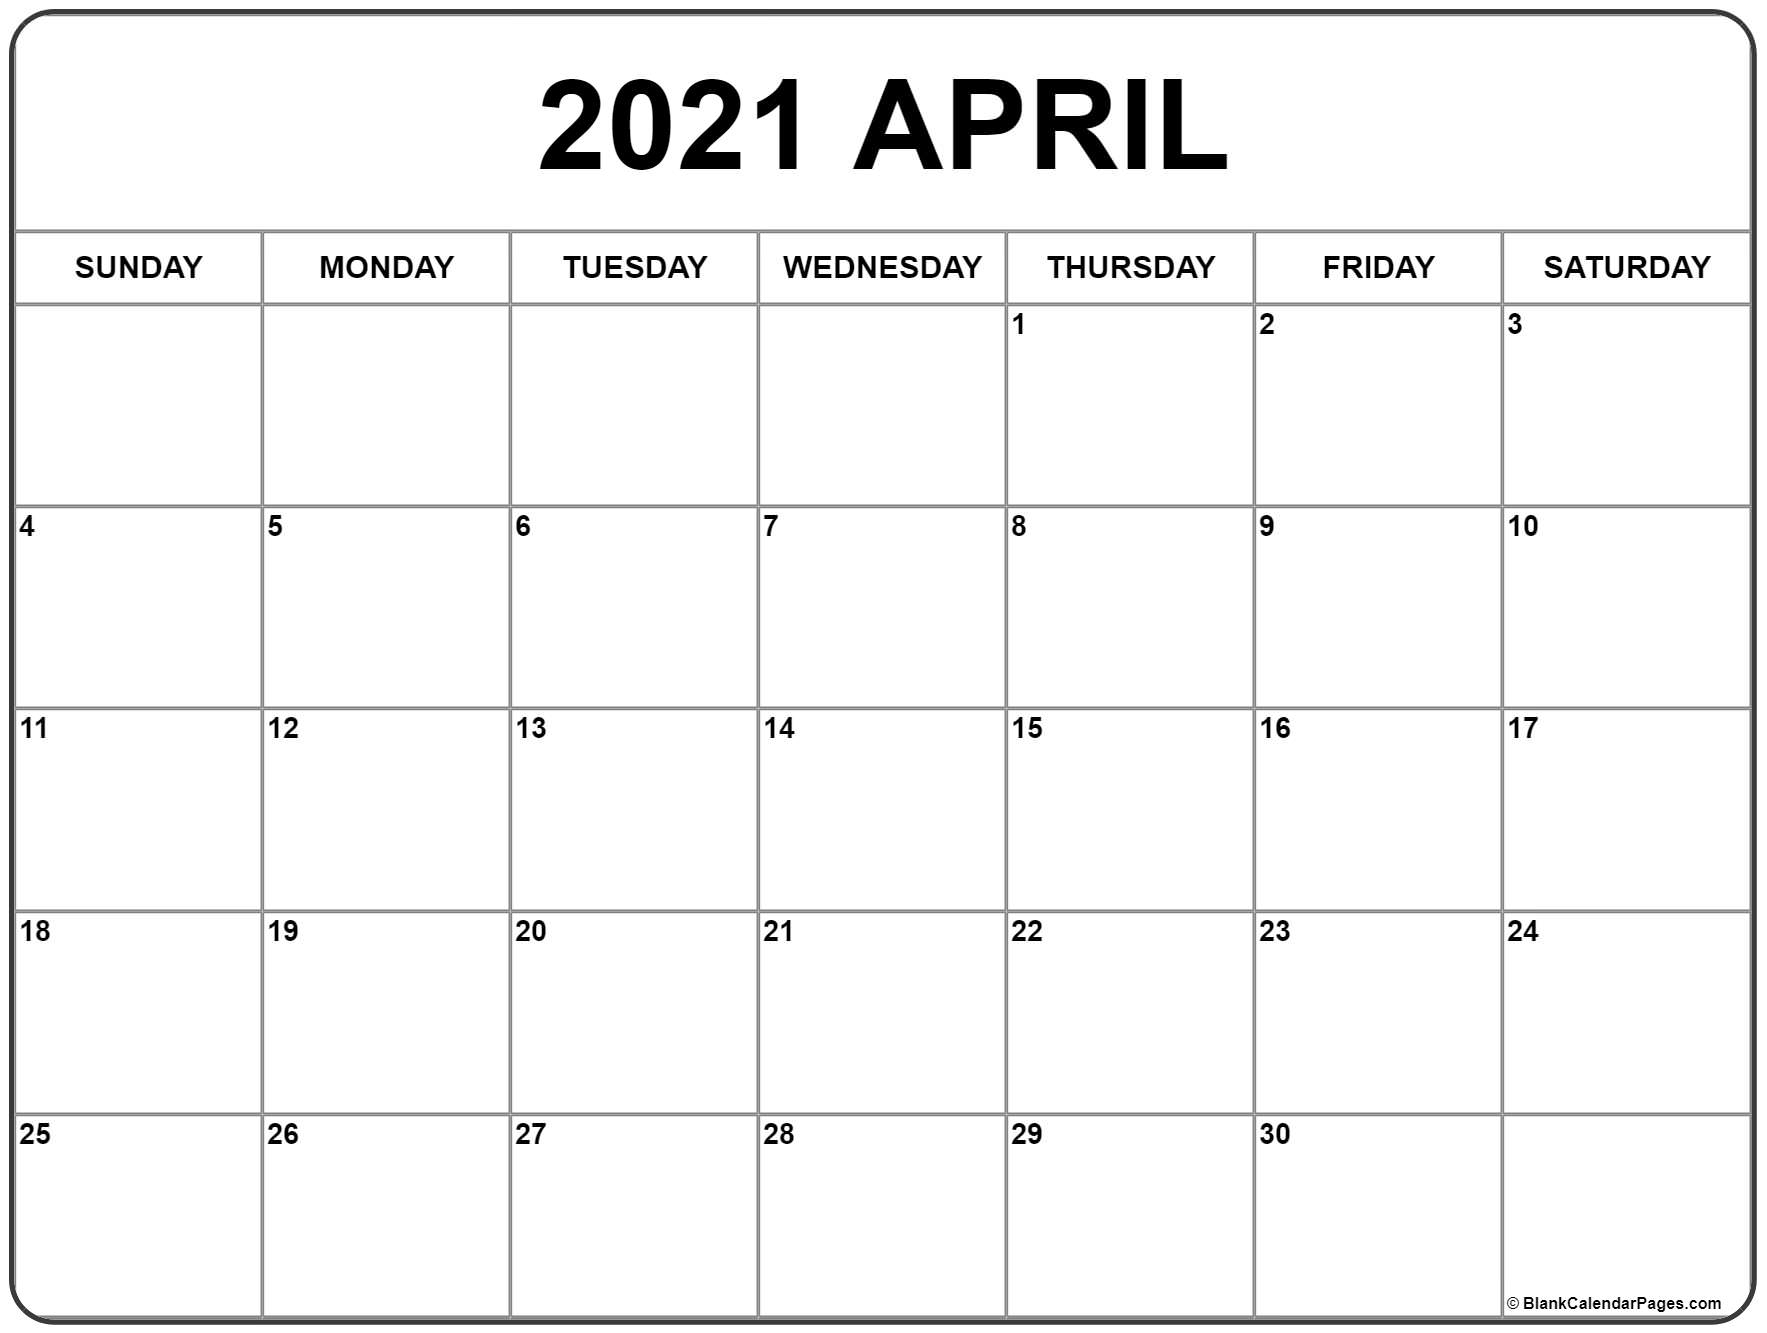 April 2021 Calendar | Free Printable Monthly Calendars in Printable Fill In Calendar 2021